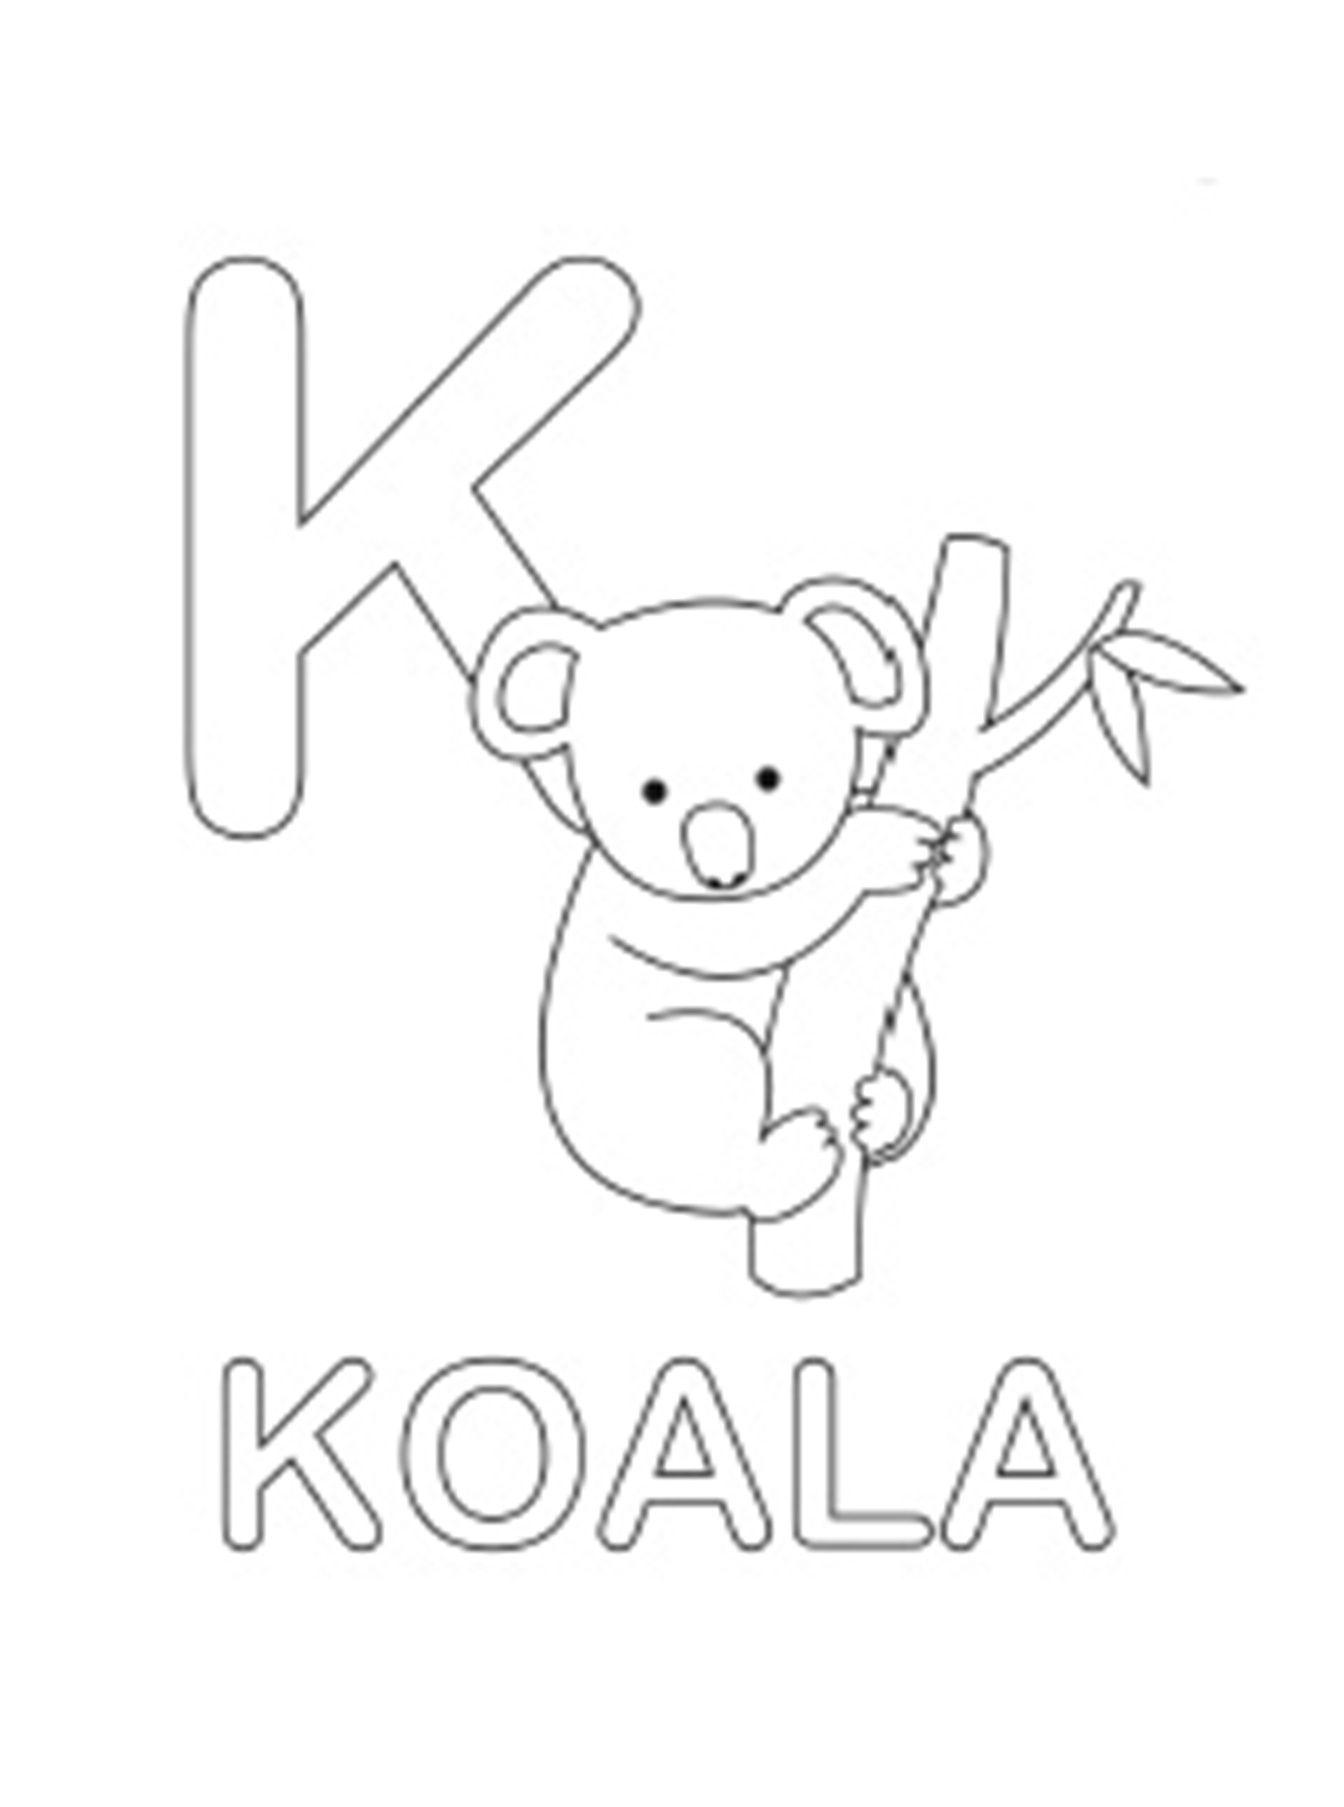 Koala Alphabet Coloring Pages Free